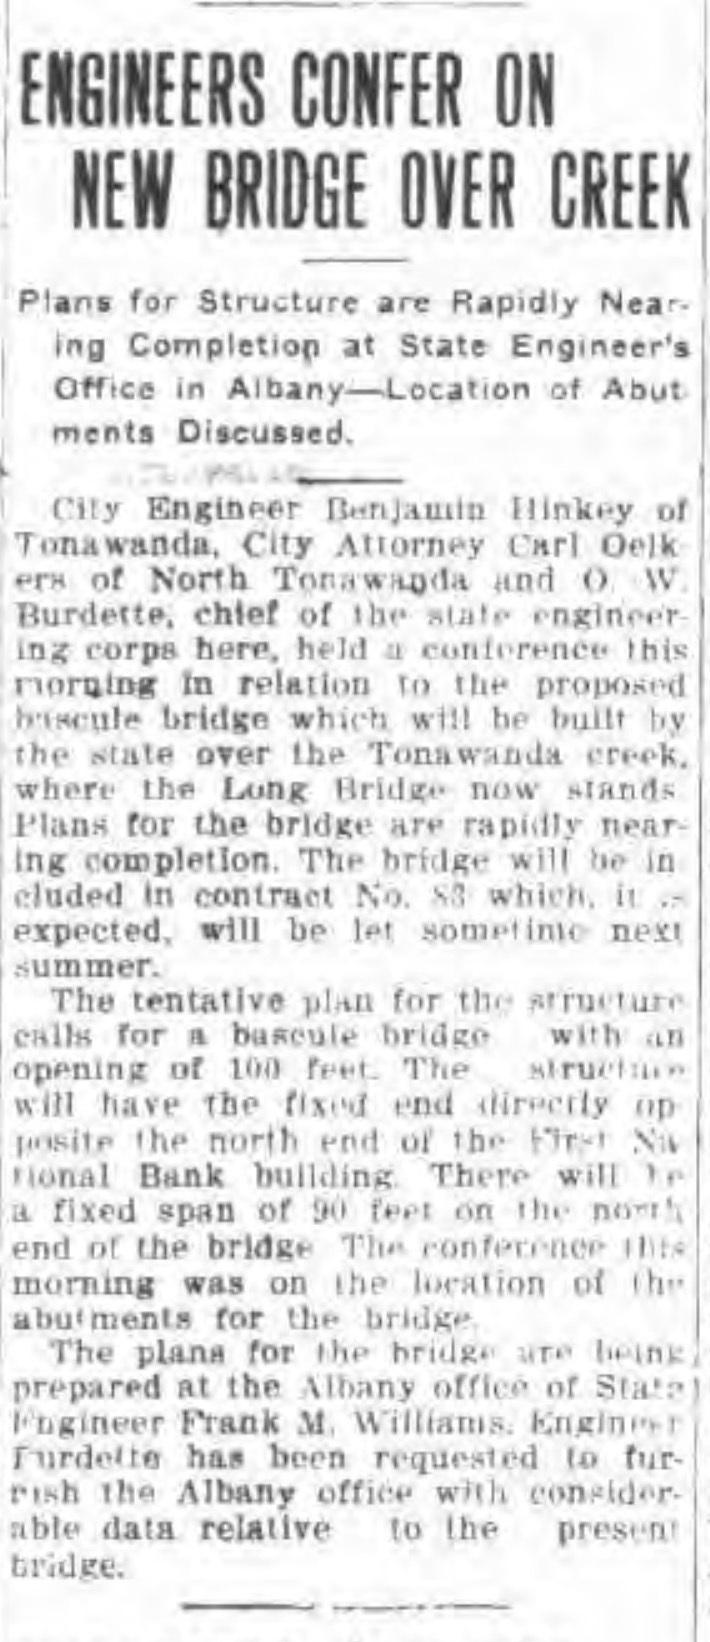 Engineers confer on new bridge over creek, article (Tonawanda News, 1916-03-17).jpg